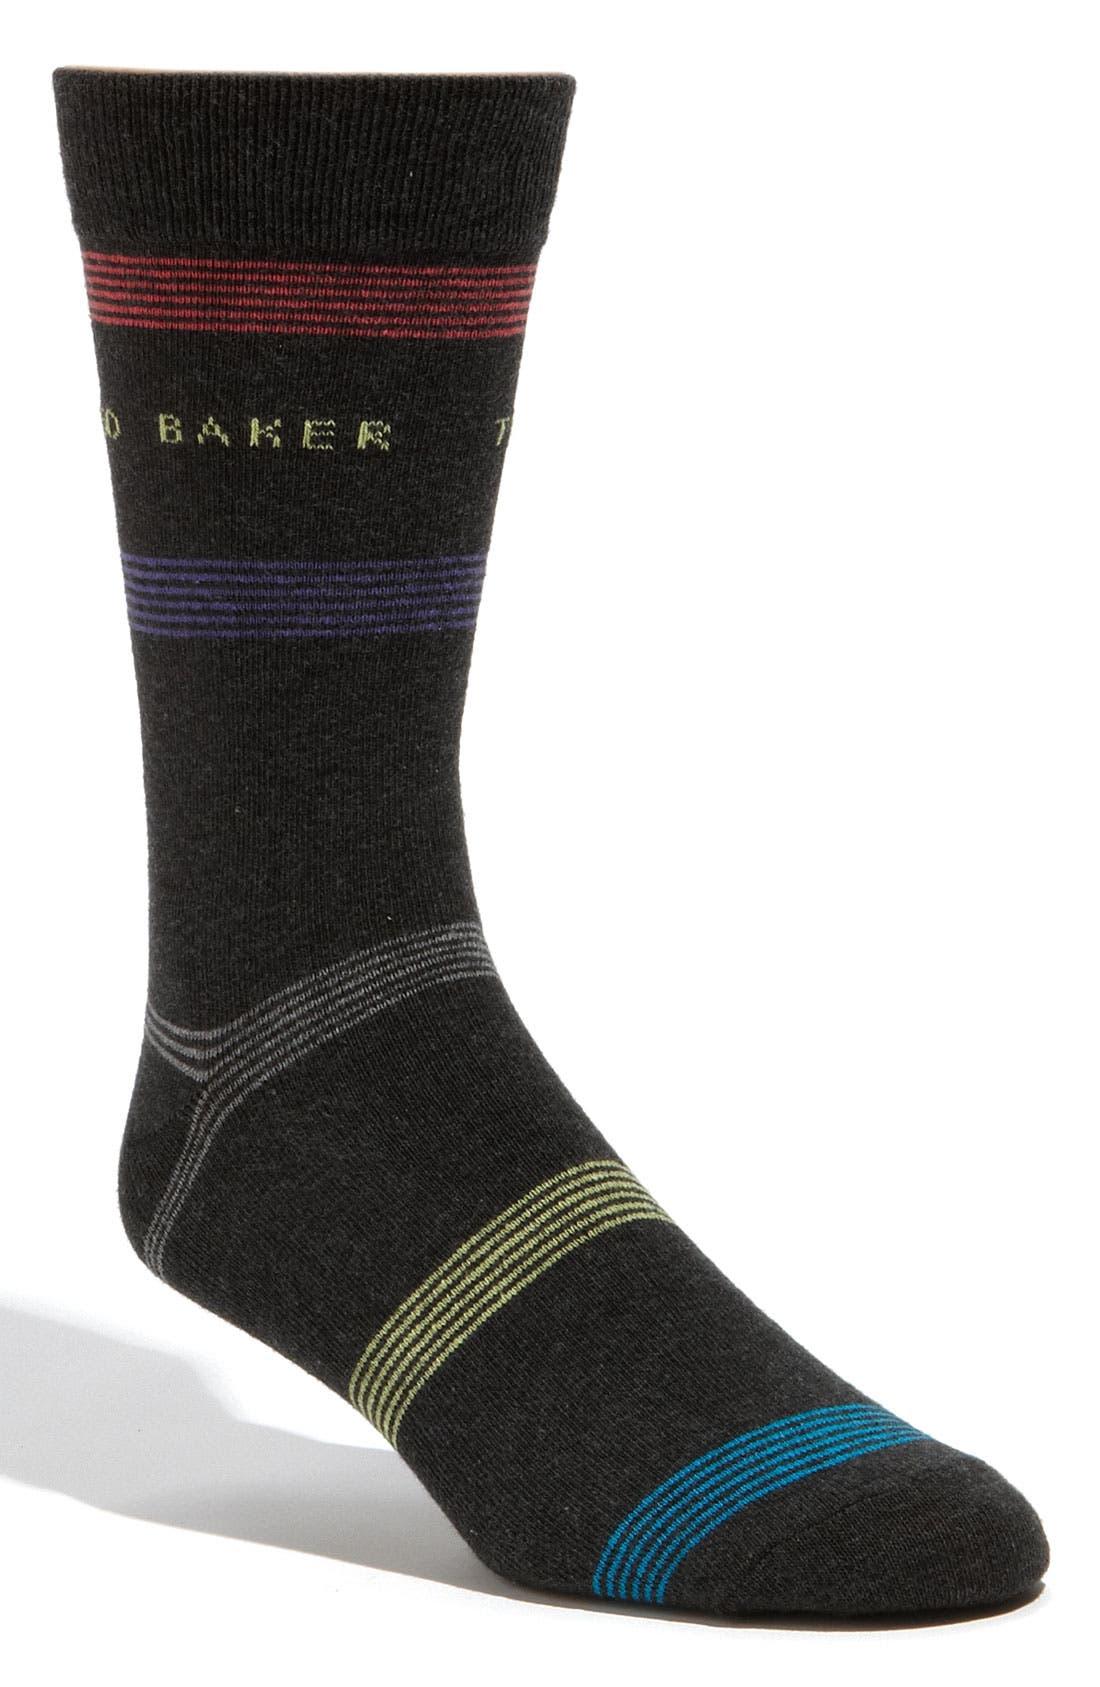 Alternate Image 1 Selected - Ted Baker London 'Spaced Stripe' Socks